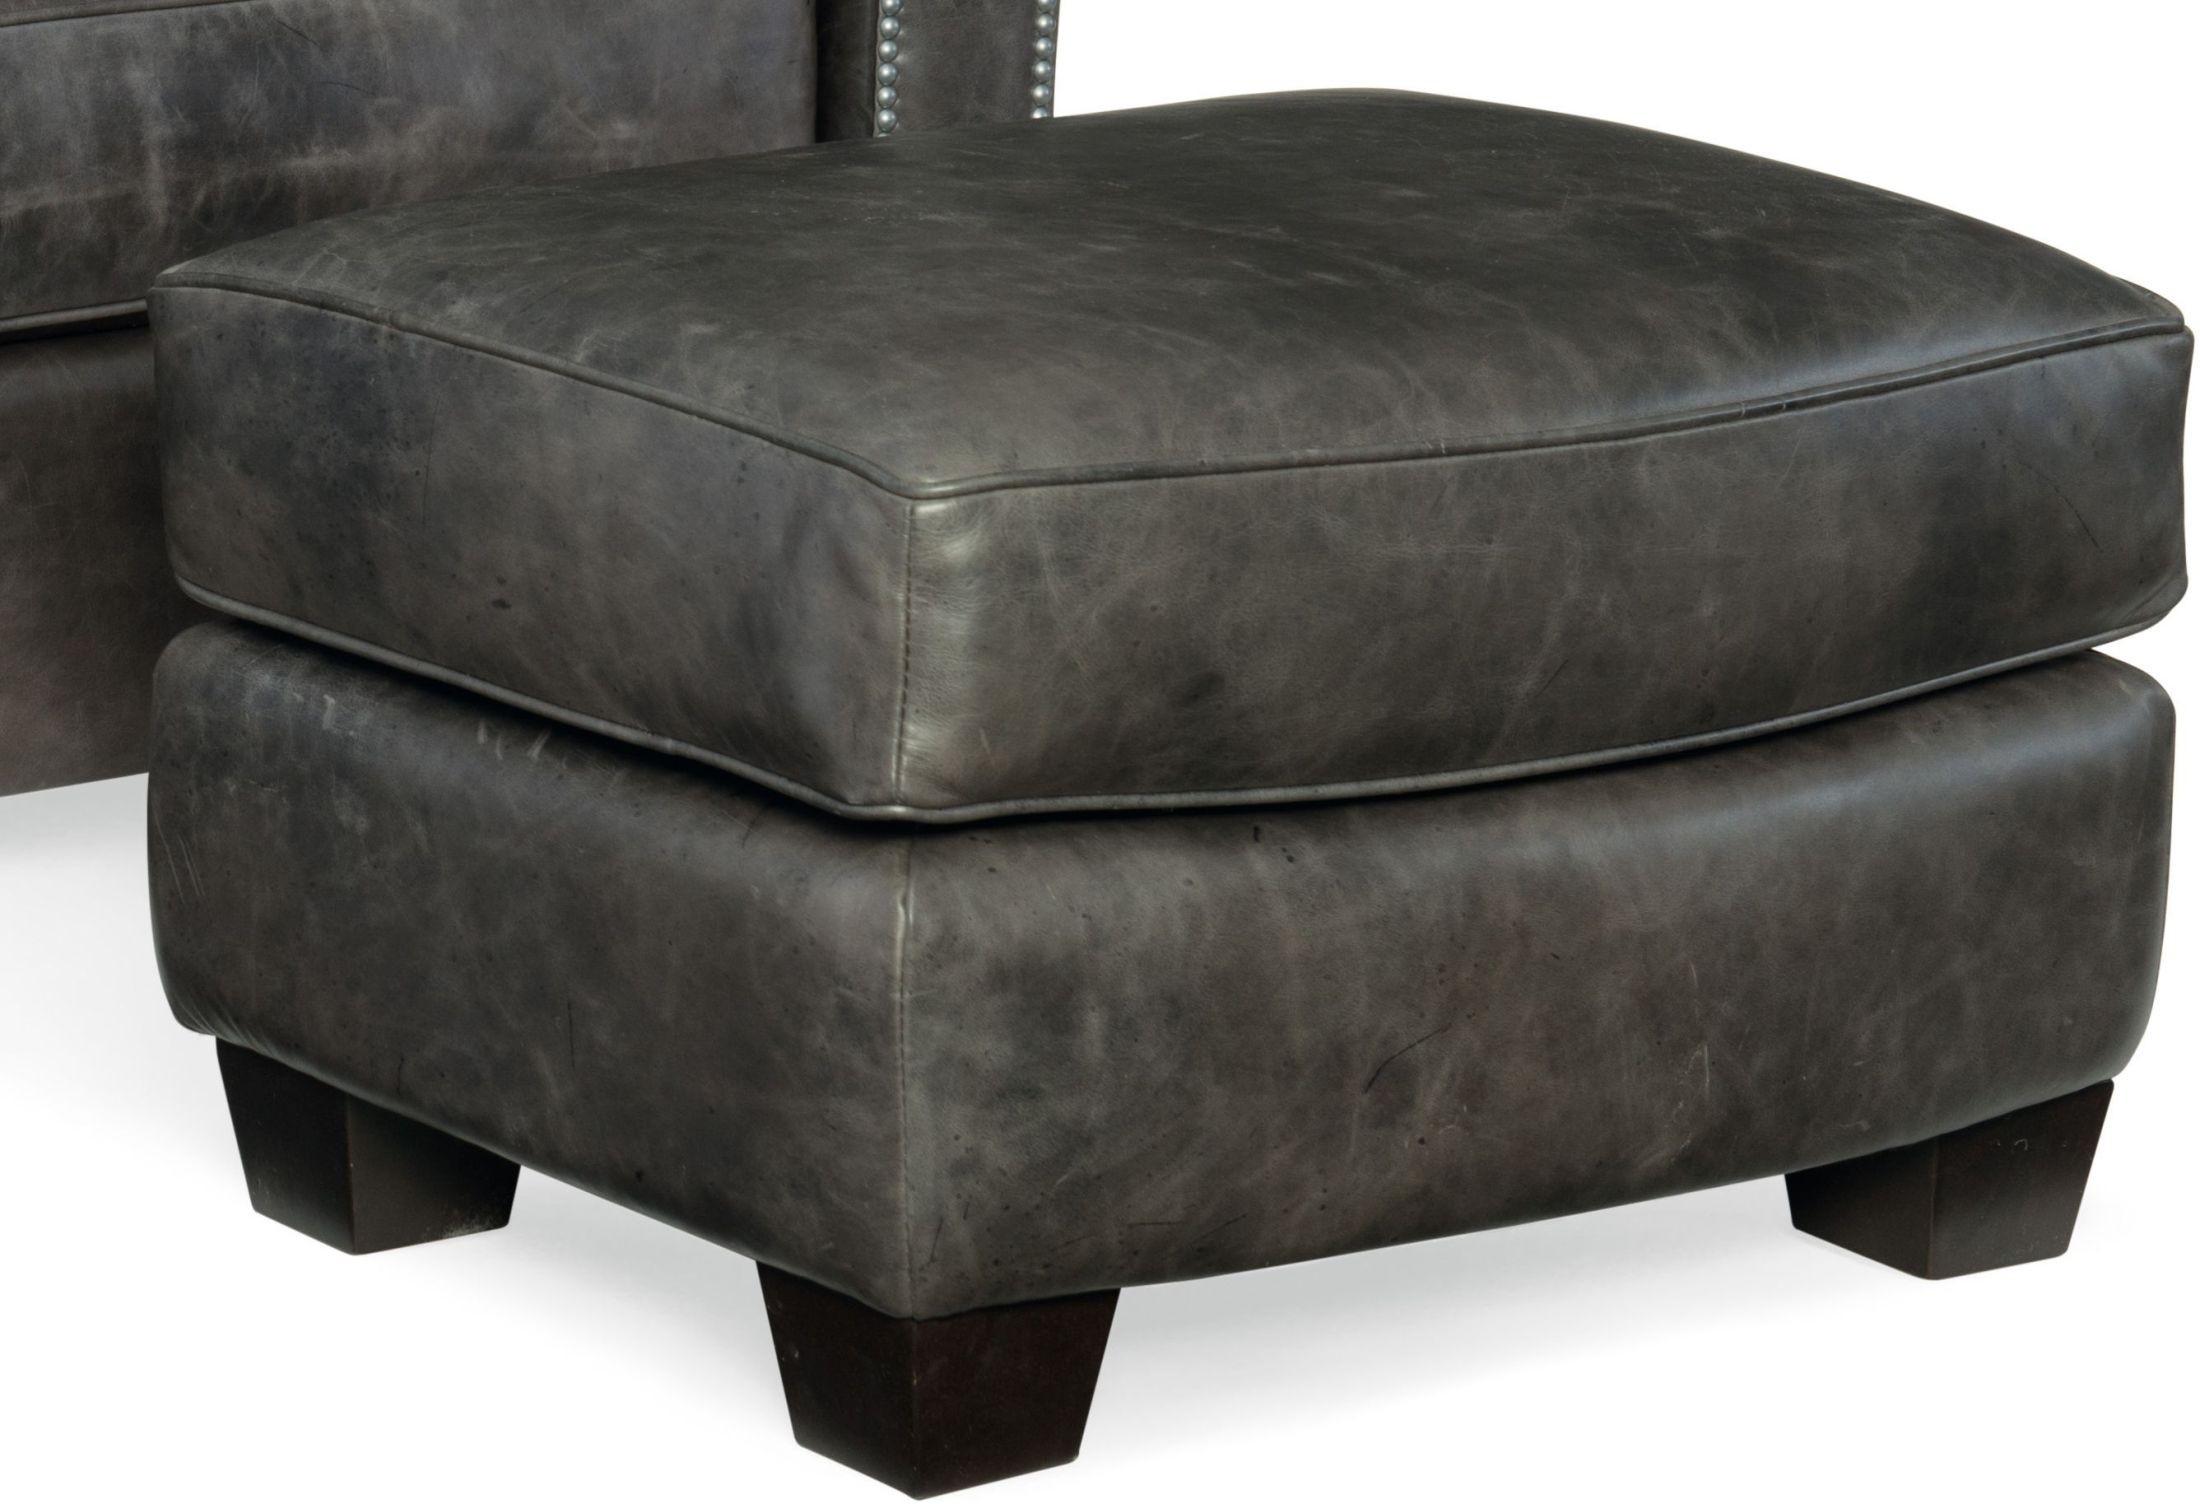 Trellis Gray Leather Ottoman, SS373-OT-096, Hooker Furniture